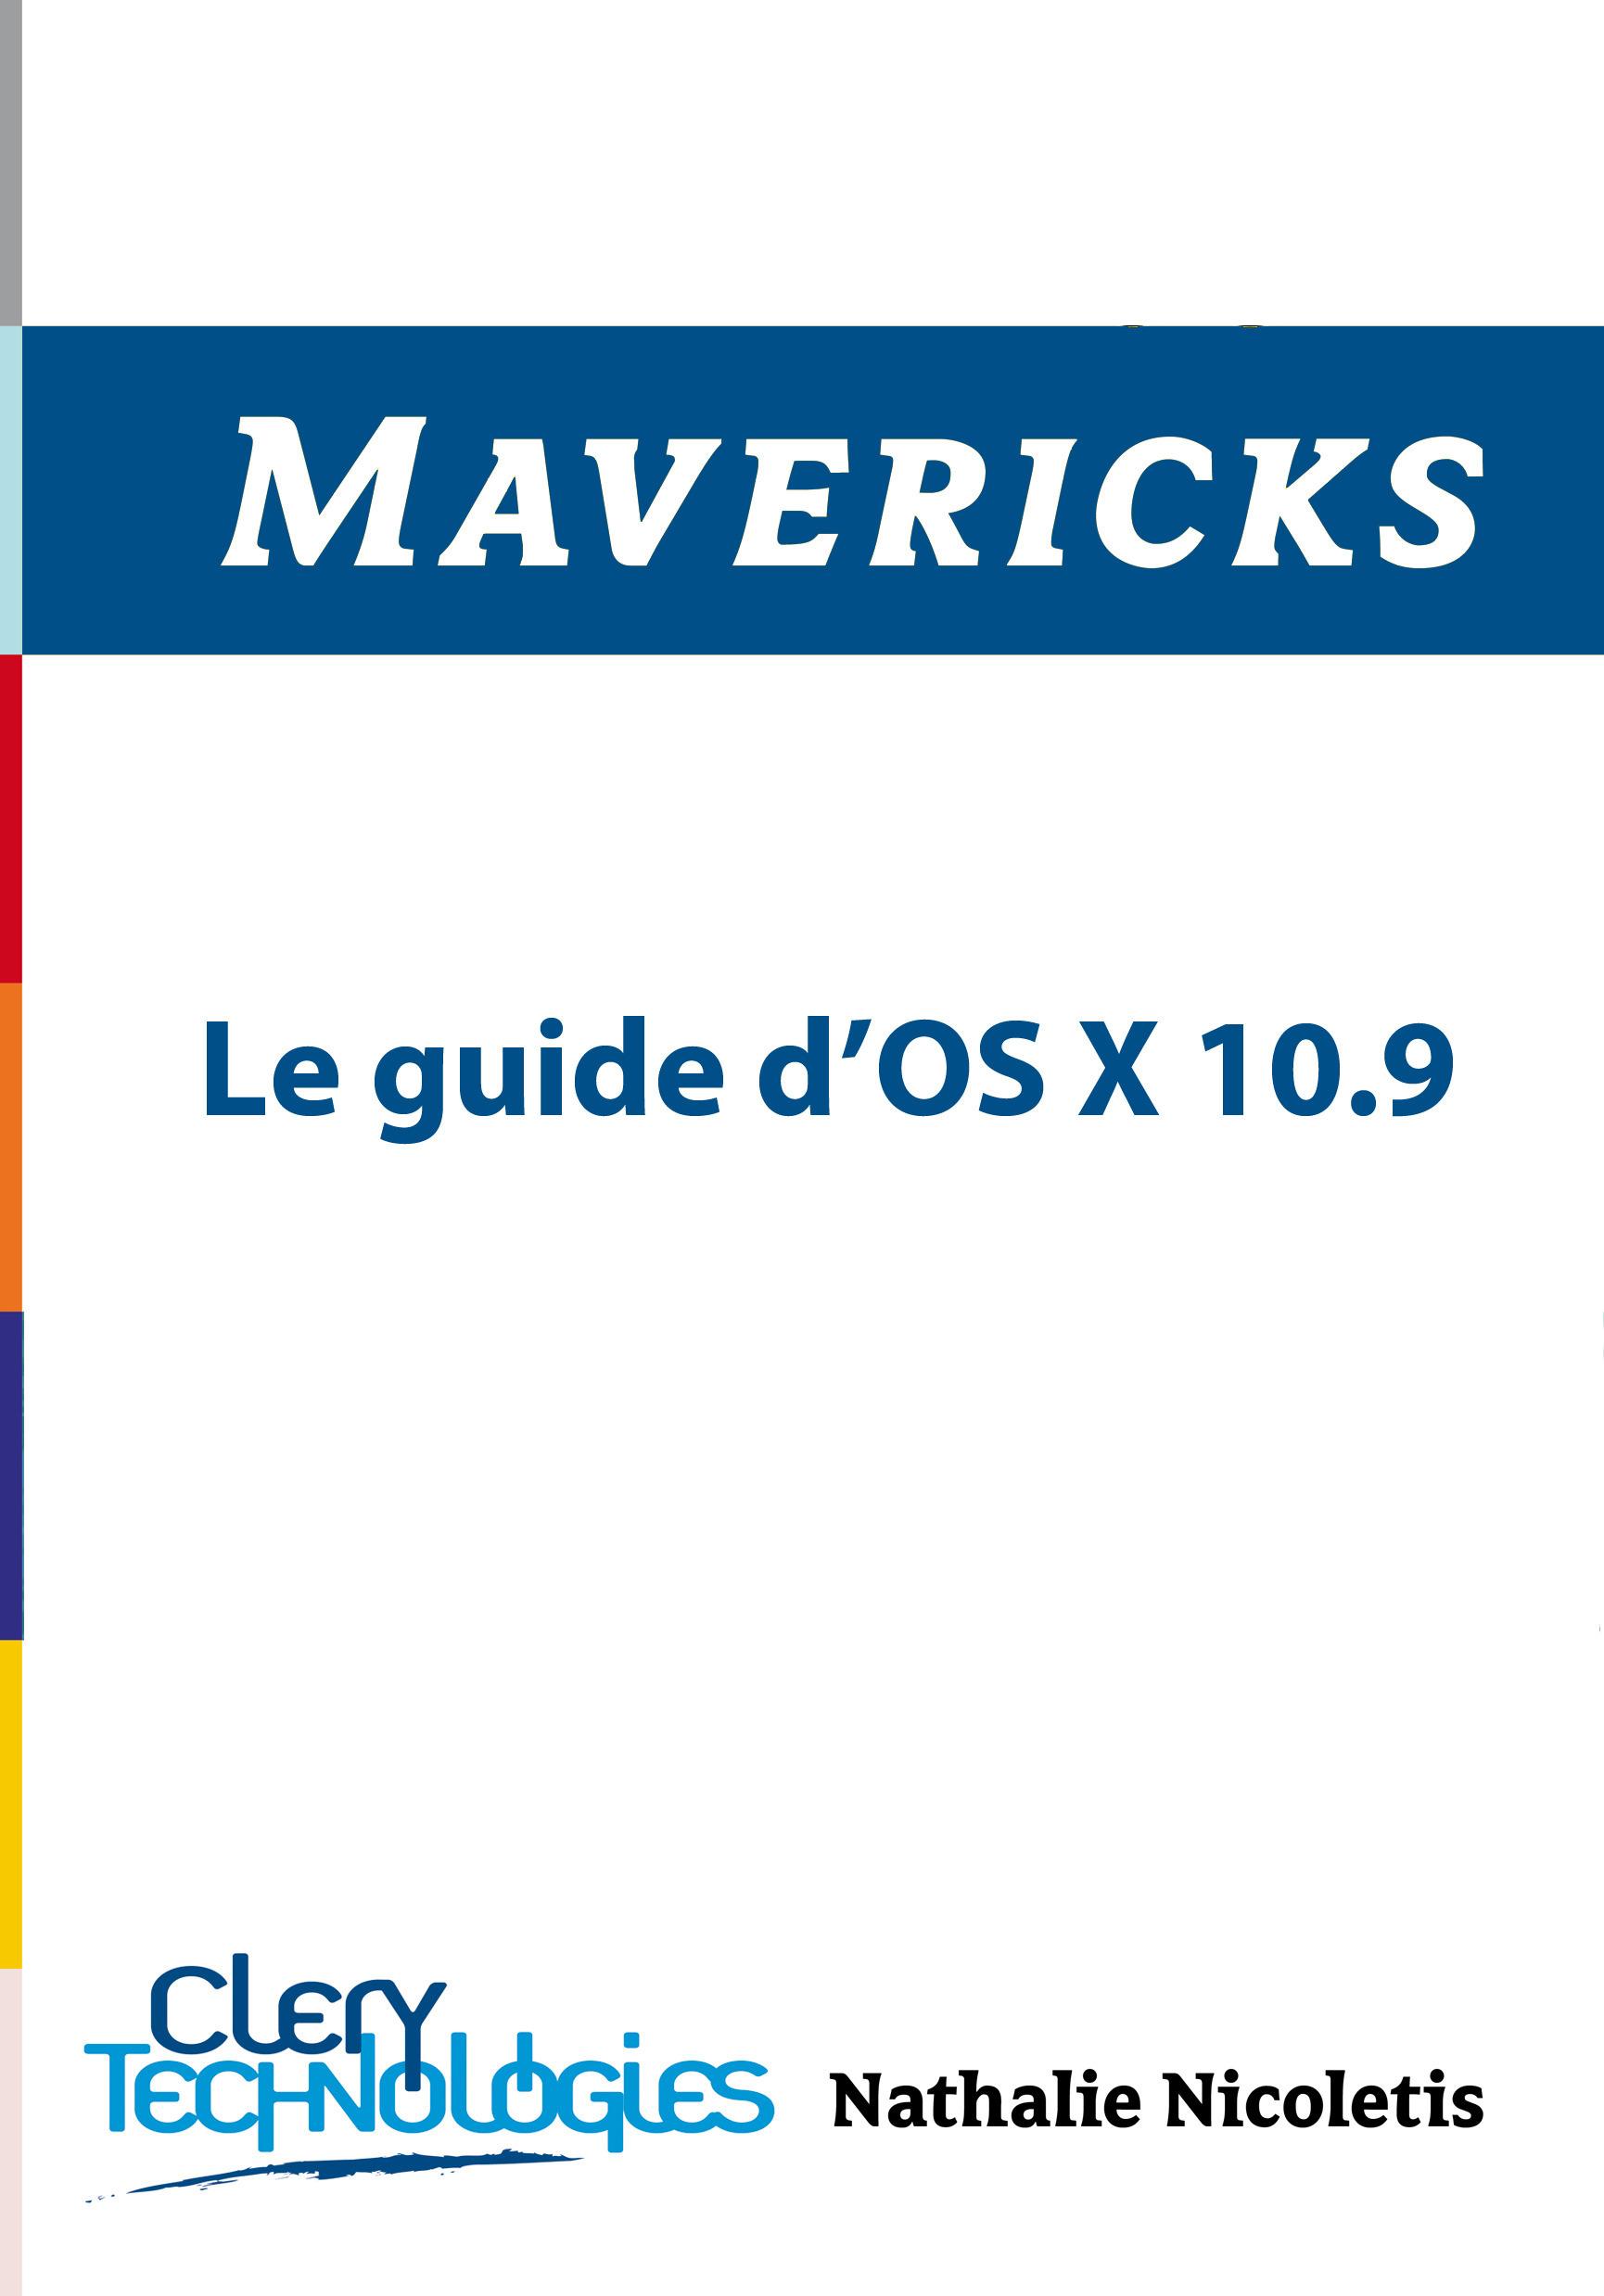 le guide d'OS X 10.9 Mavericks